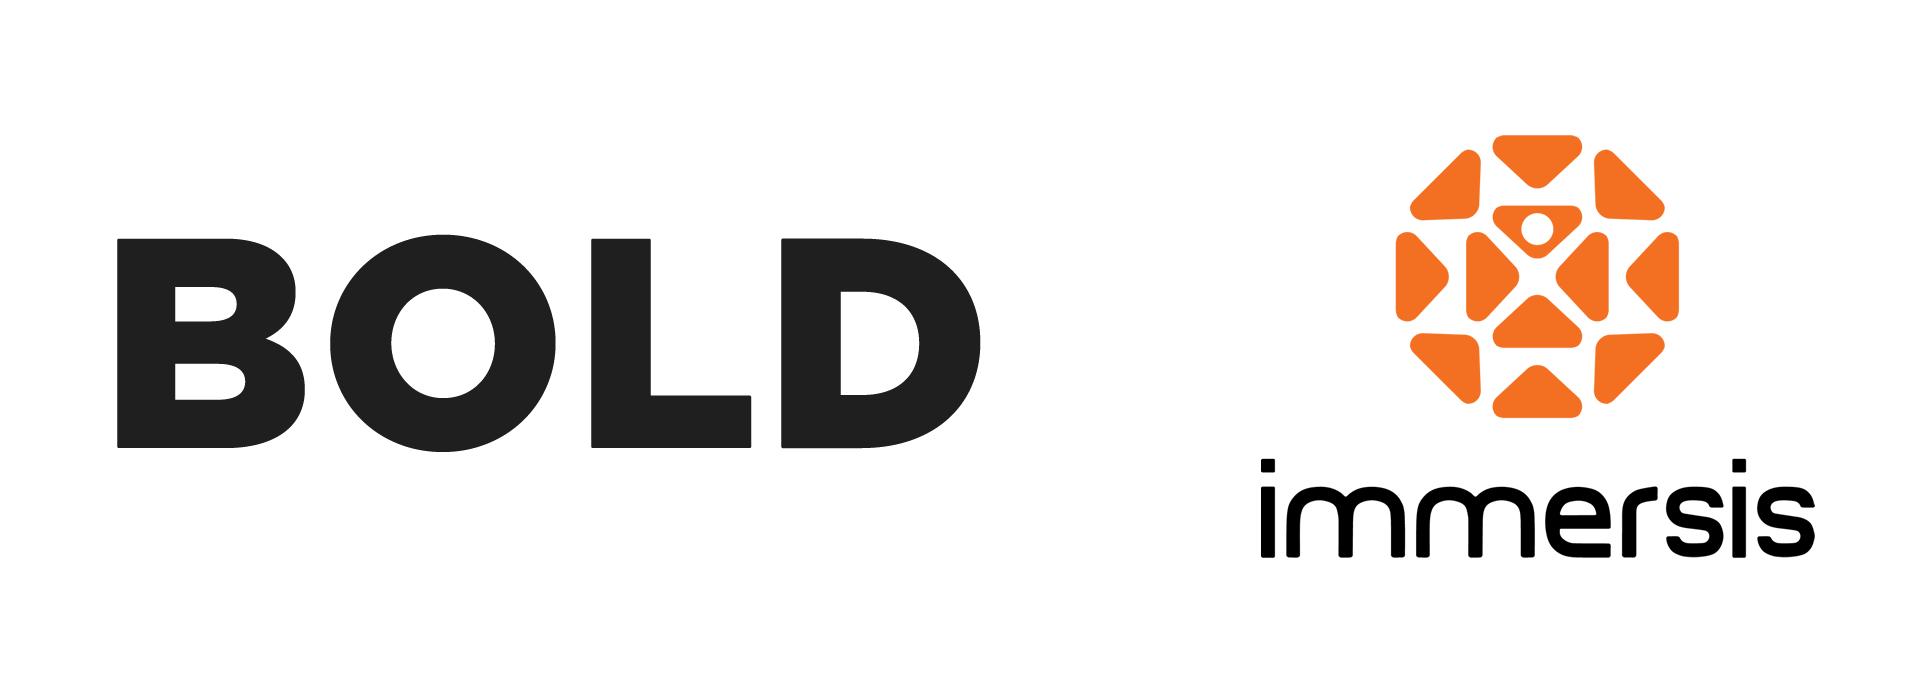 bold1